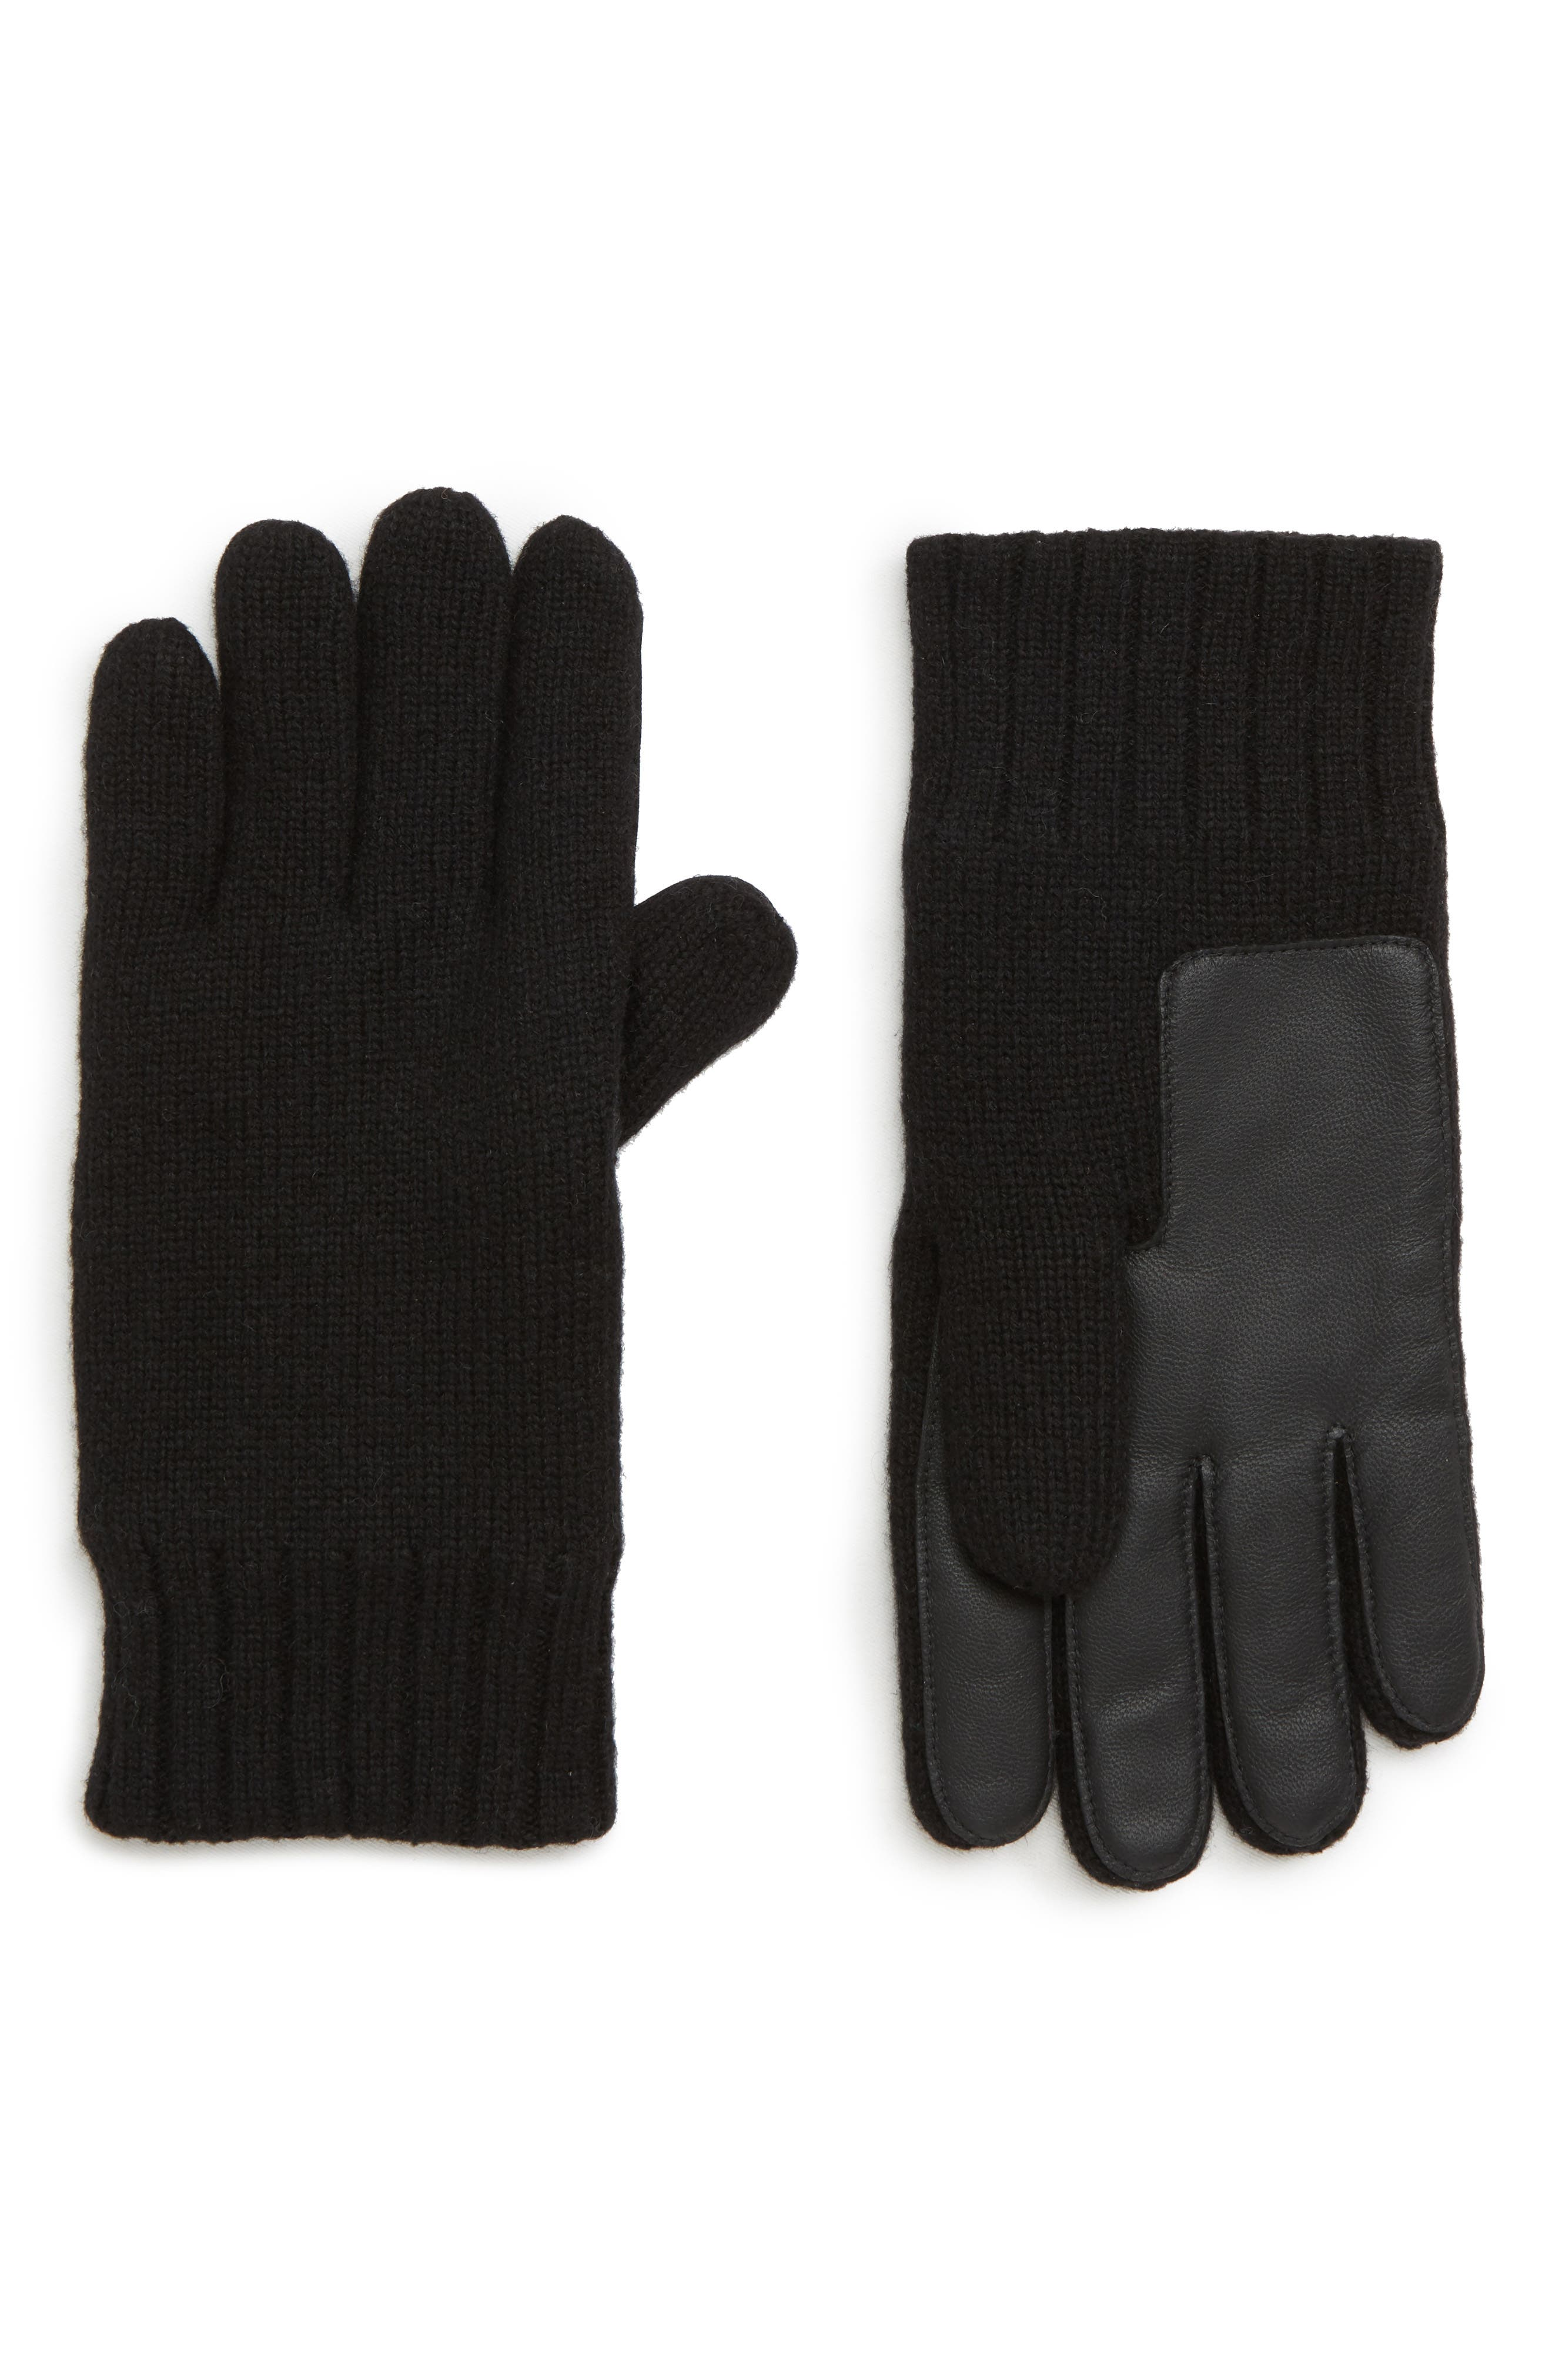 Leather Palm Knit Gloves,                             Main thumbnail 1, color,                             BLACK